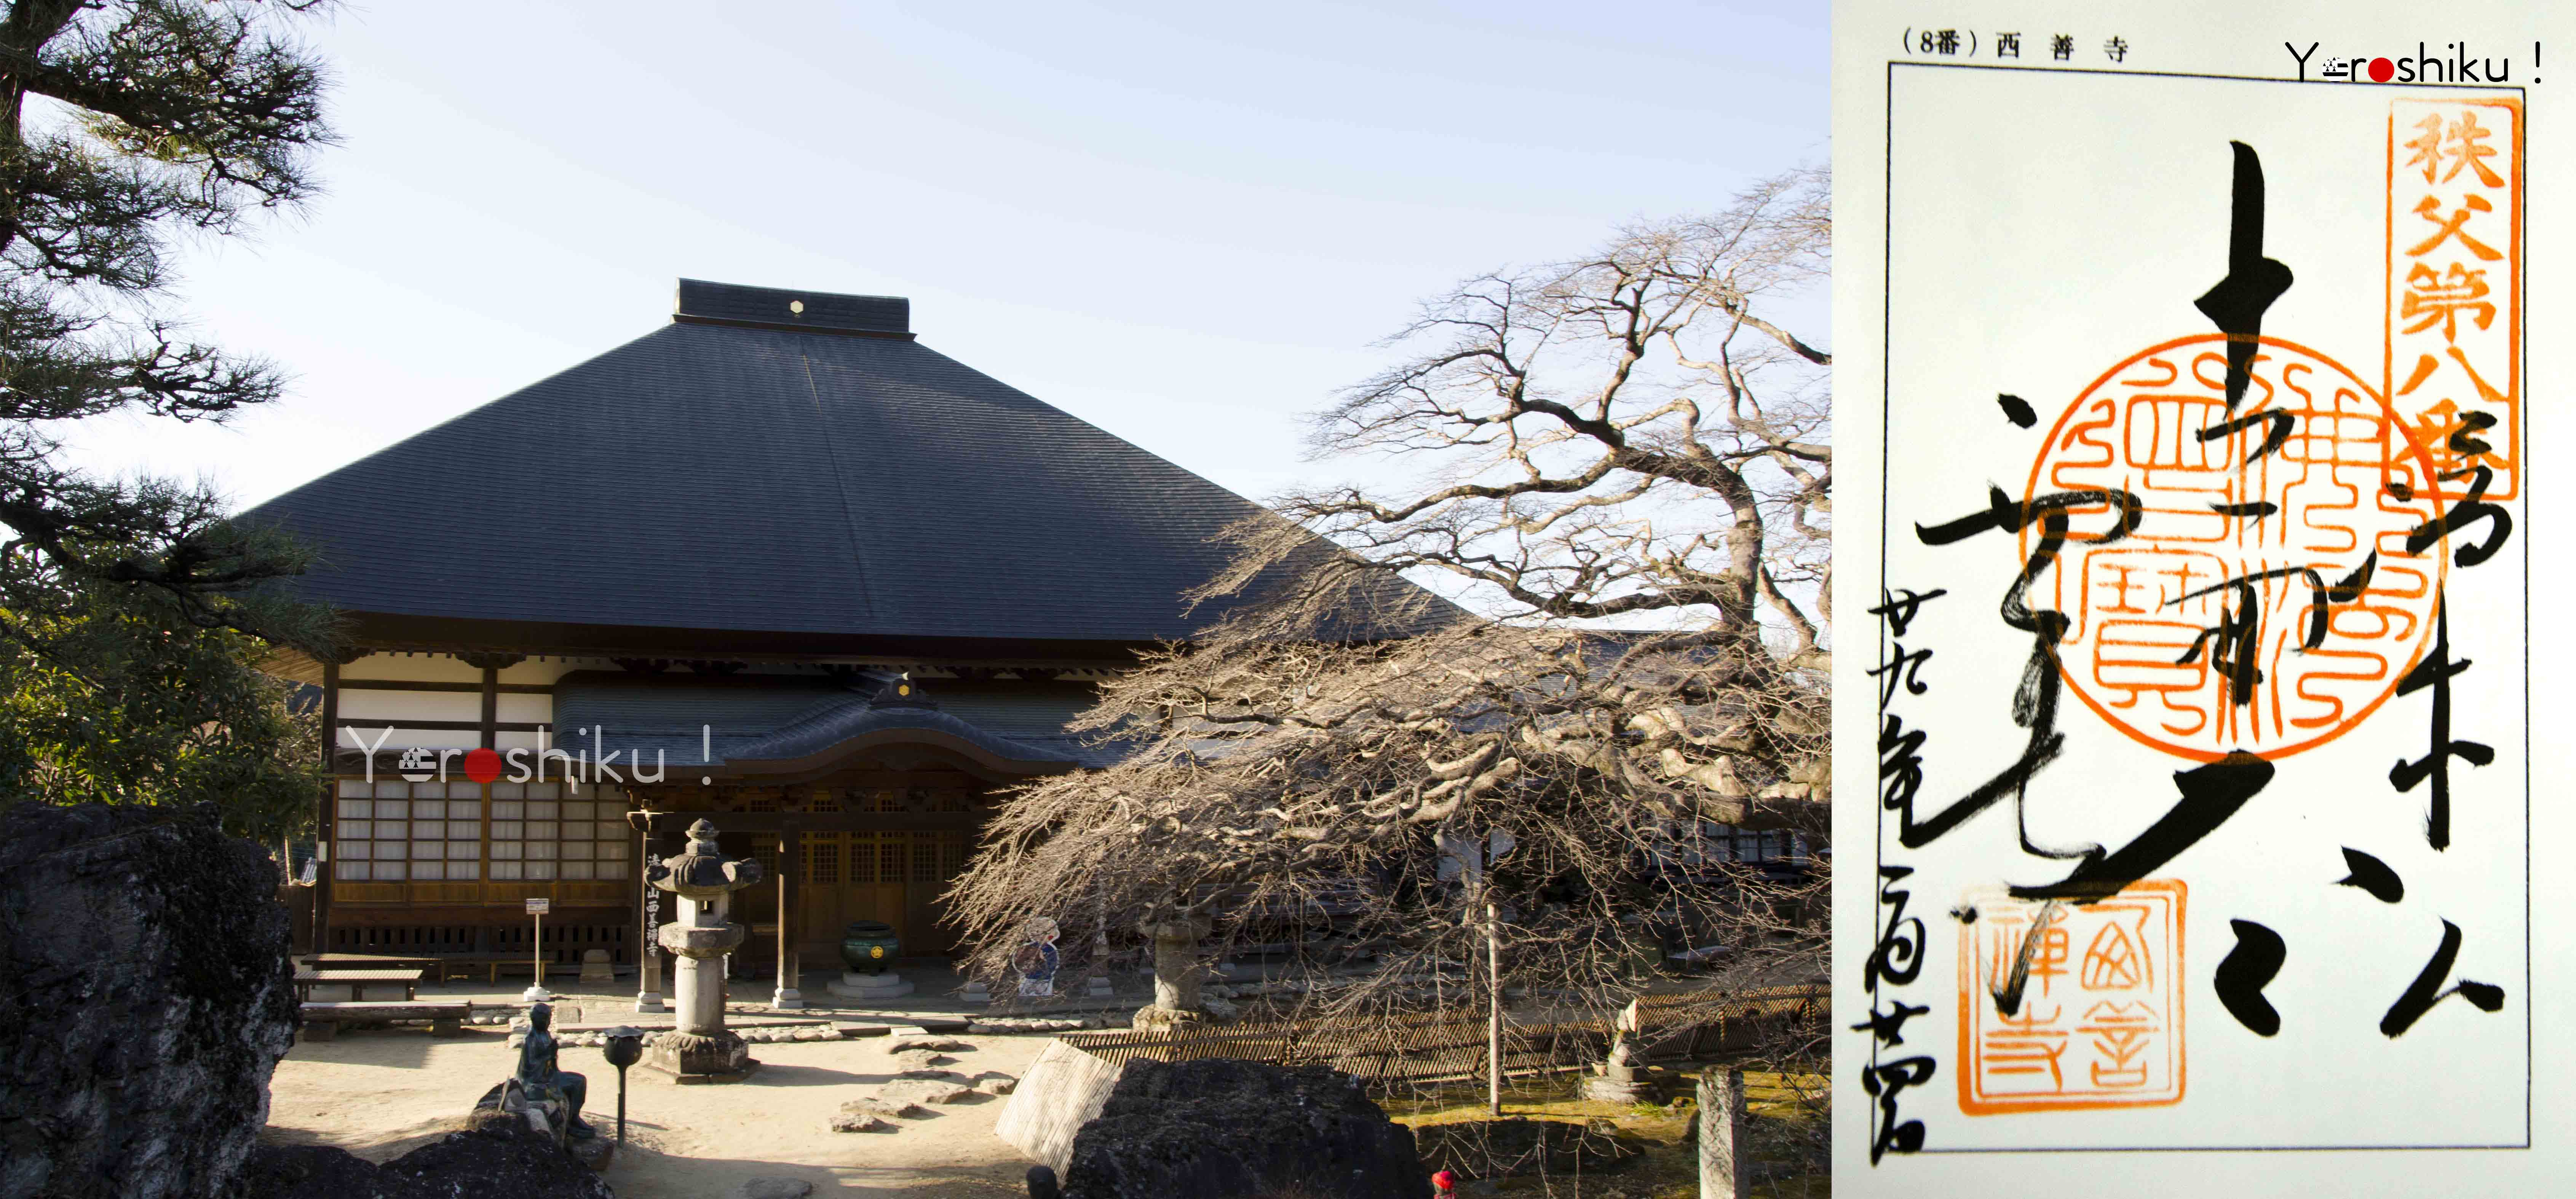 Saizenji pèlerinage de Chichibu